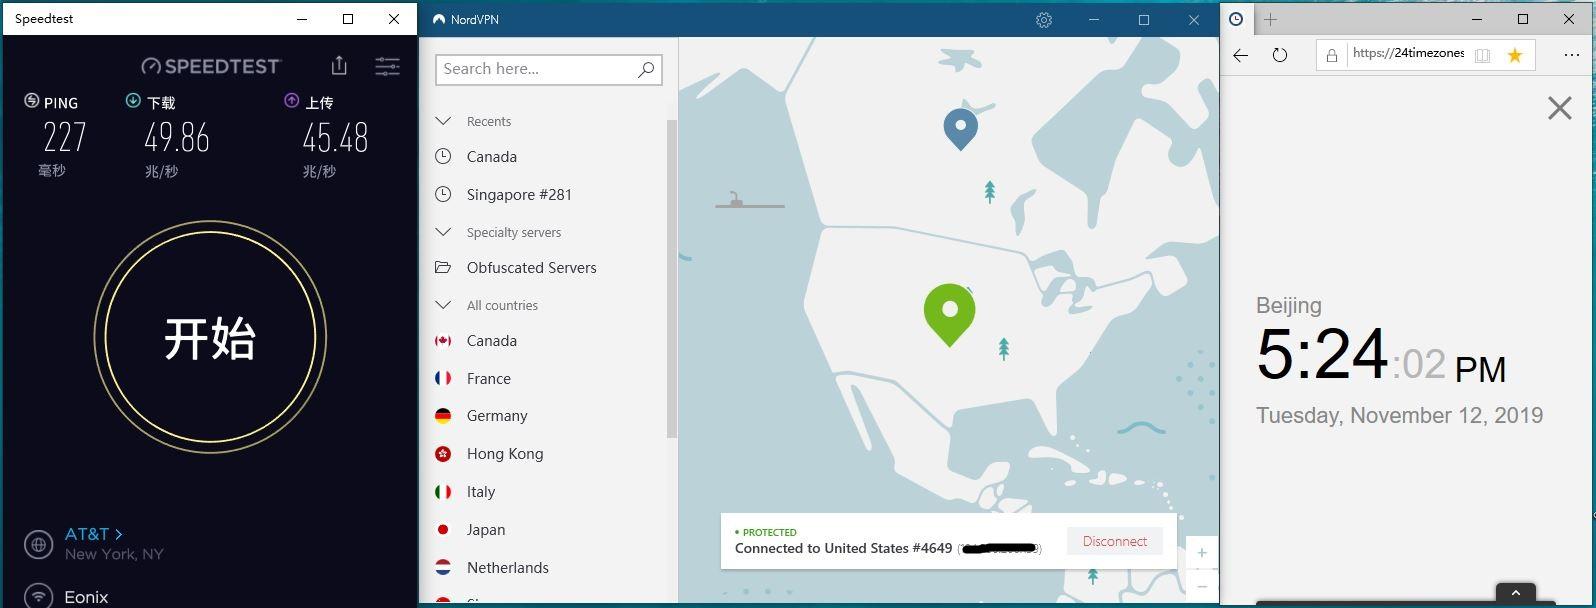 Windows-NordVPN-Untied-States4649-中国VPN翻墙-科学上网-Speedtest测速-20191112.jpg